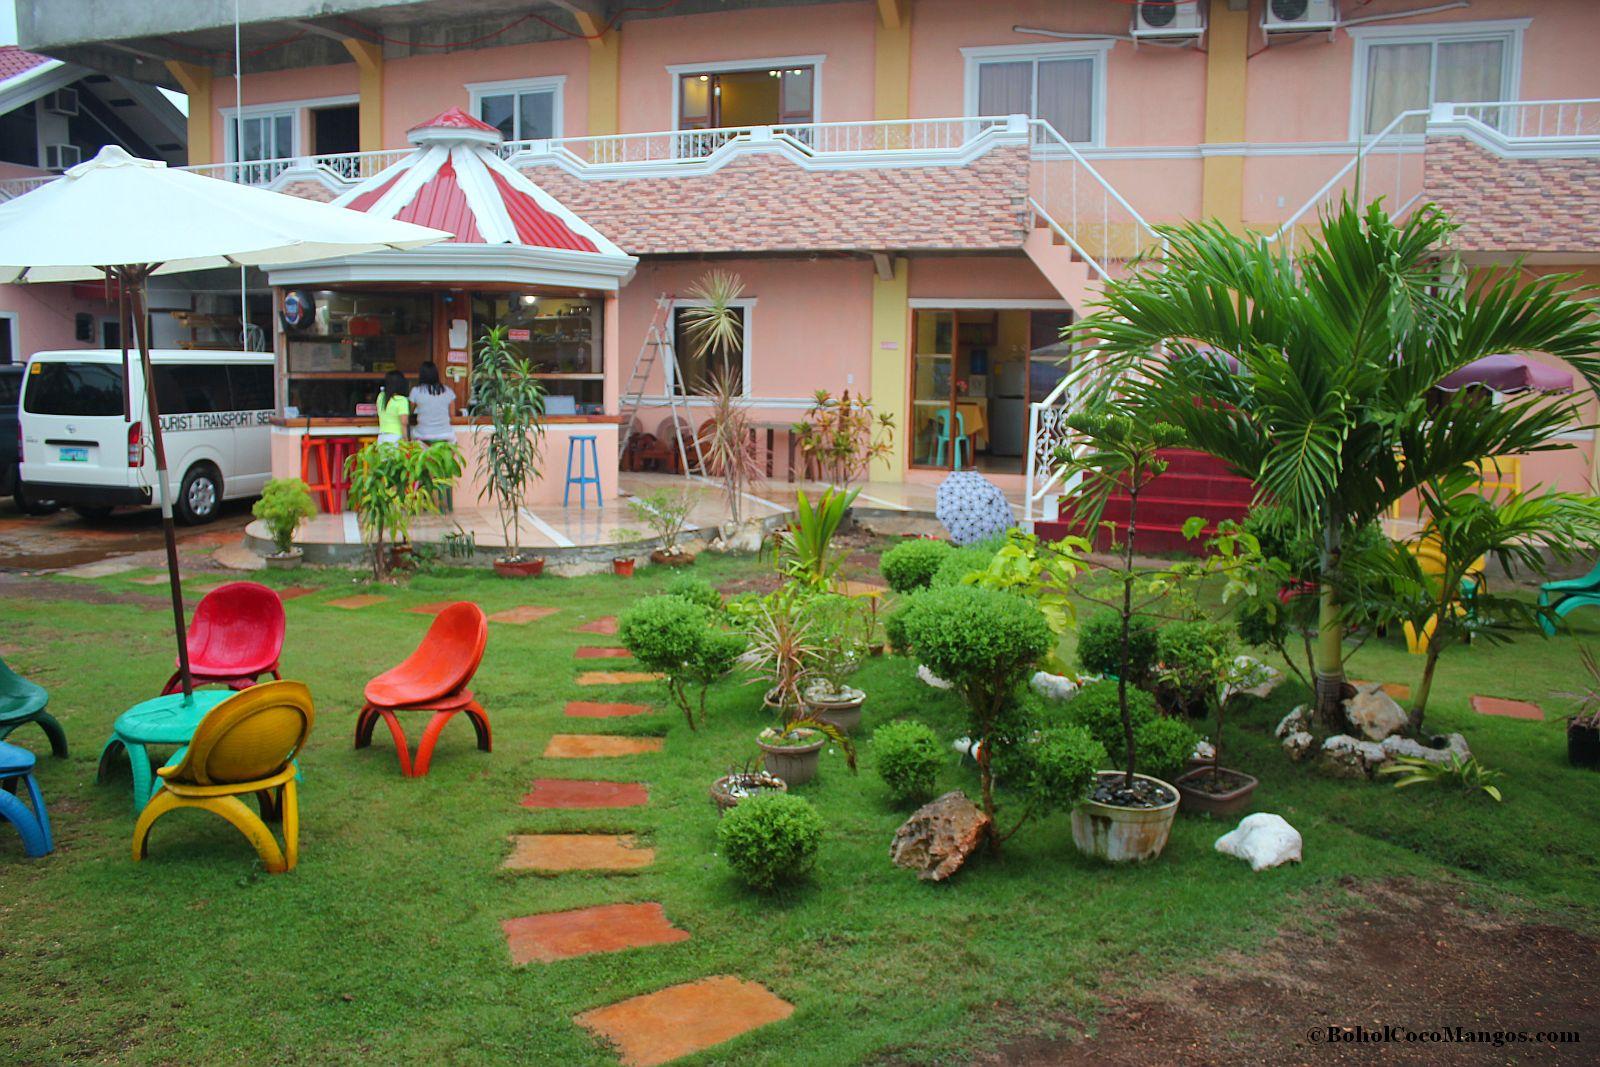 Bohol Coco Mangos Place Resort Panglao 0106 Bohol Resort Coco Mangos Panglao Island Bohol